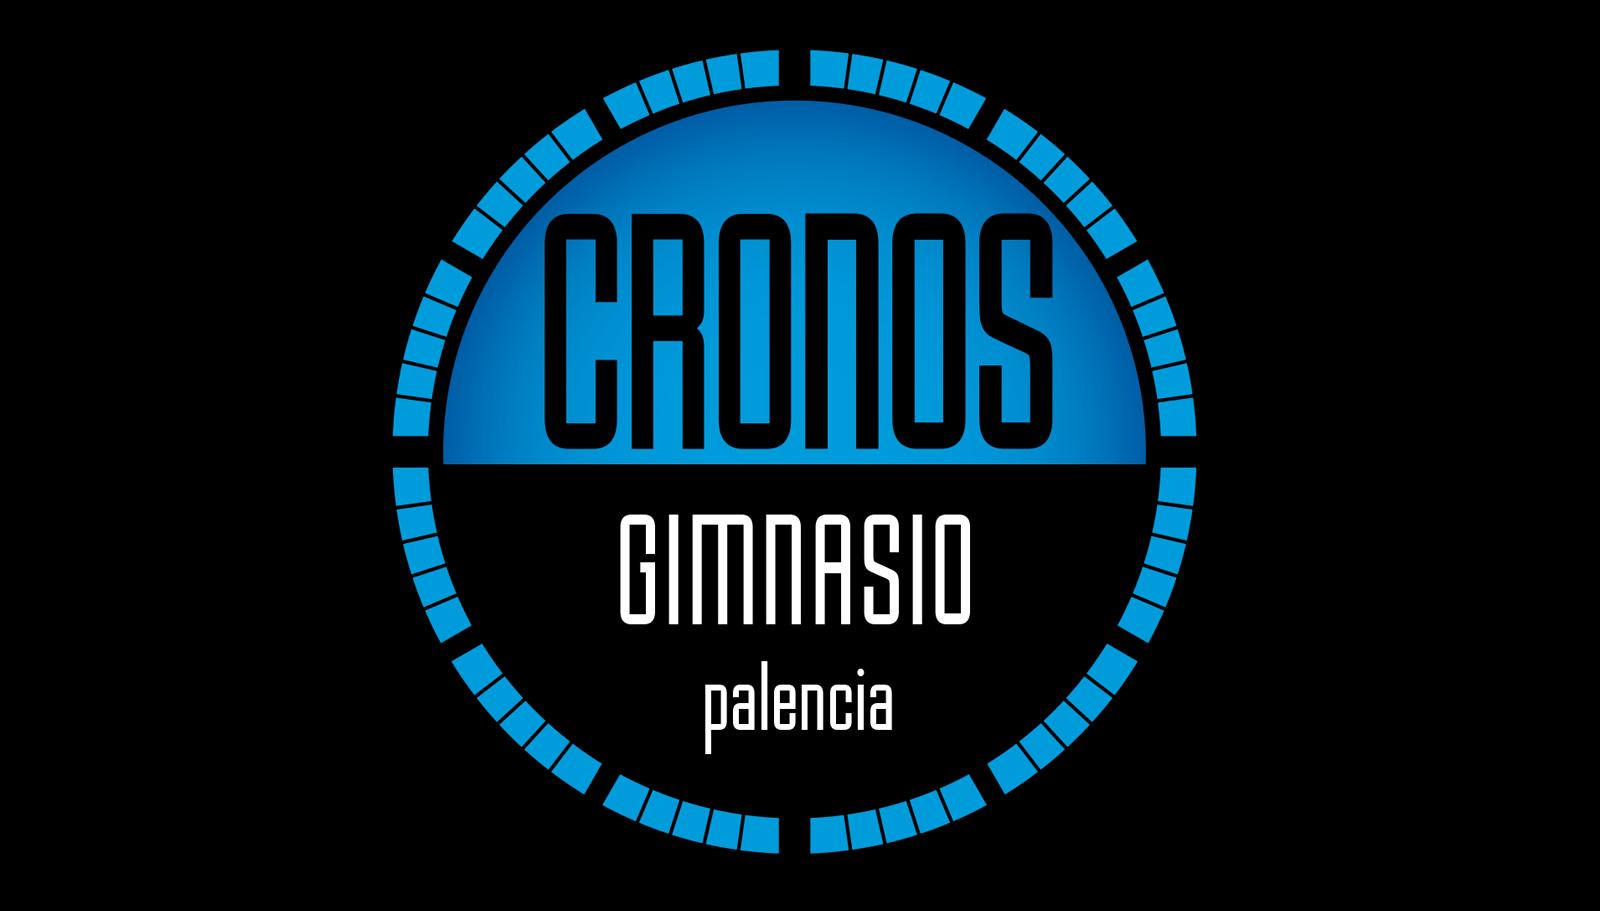 Cronos Palencia